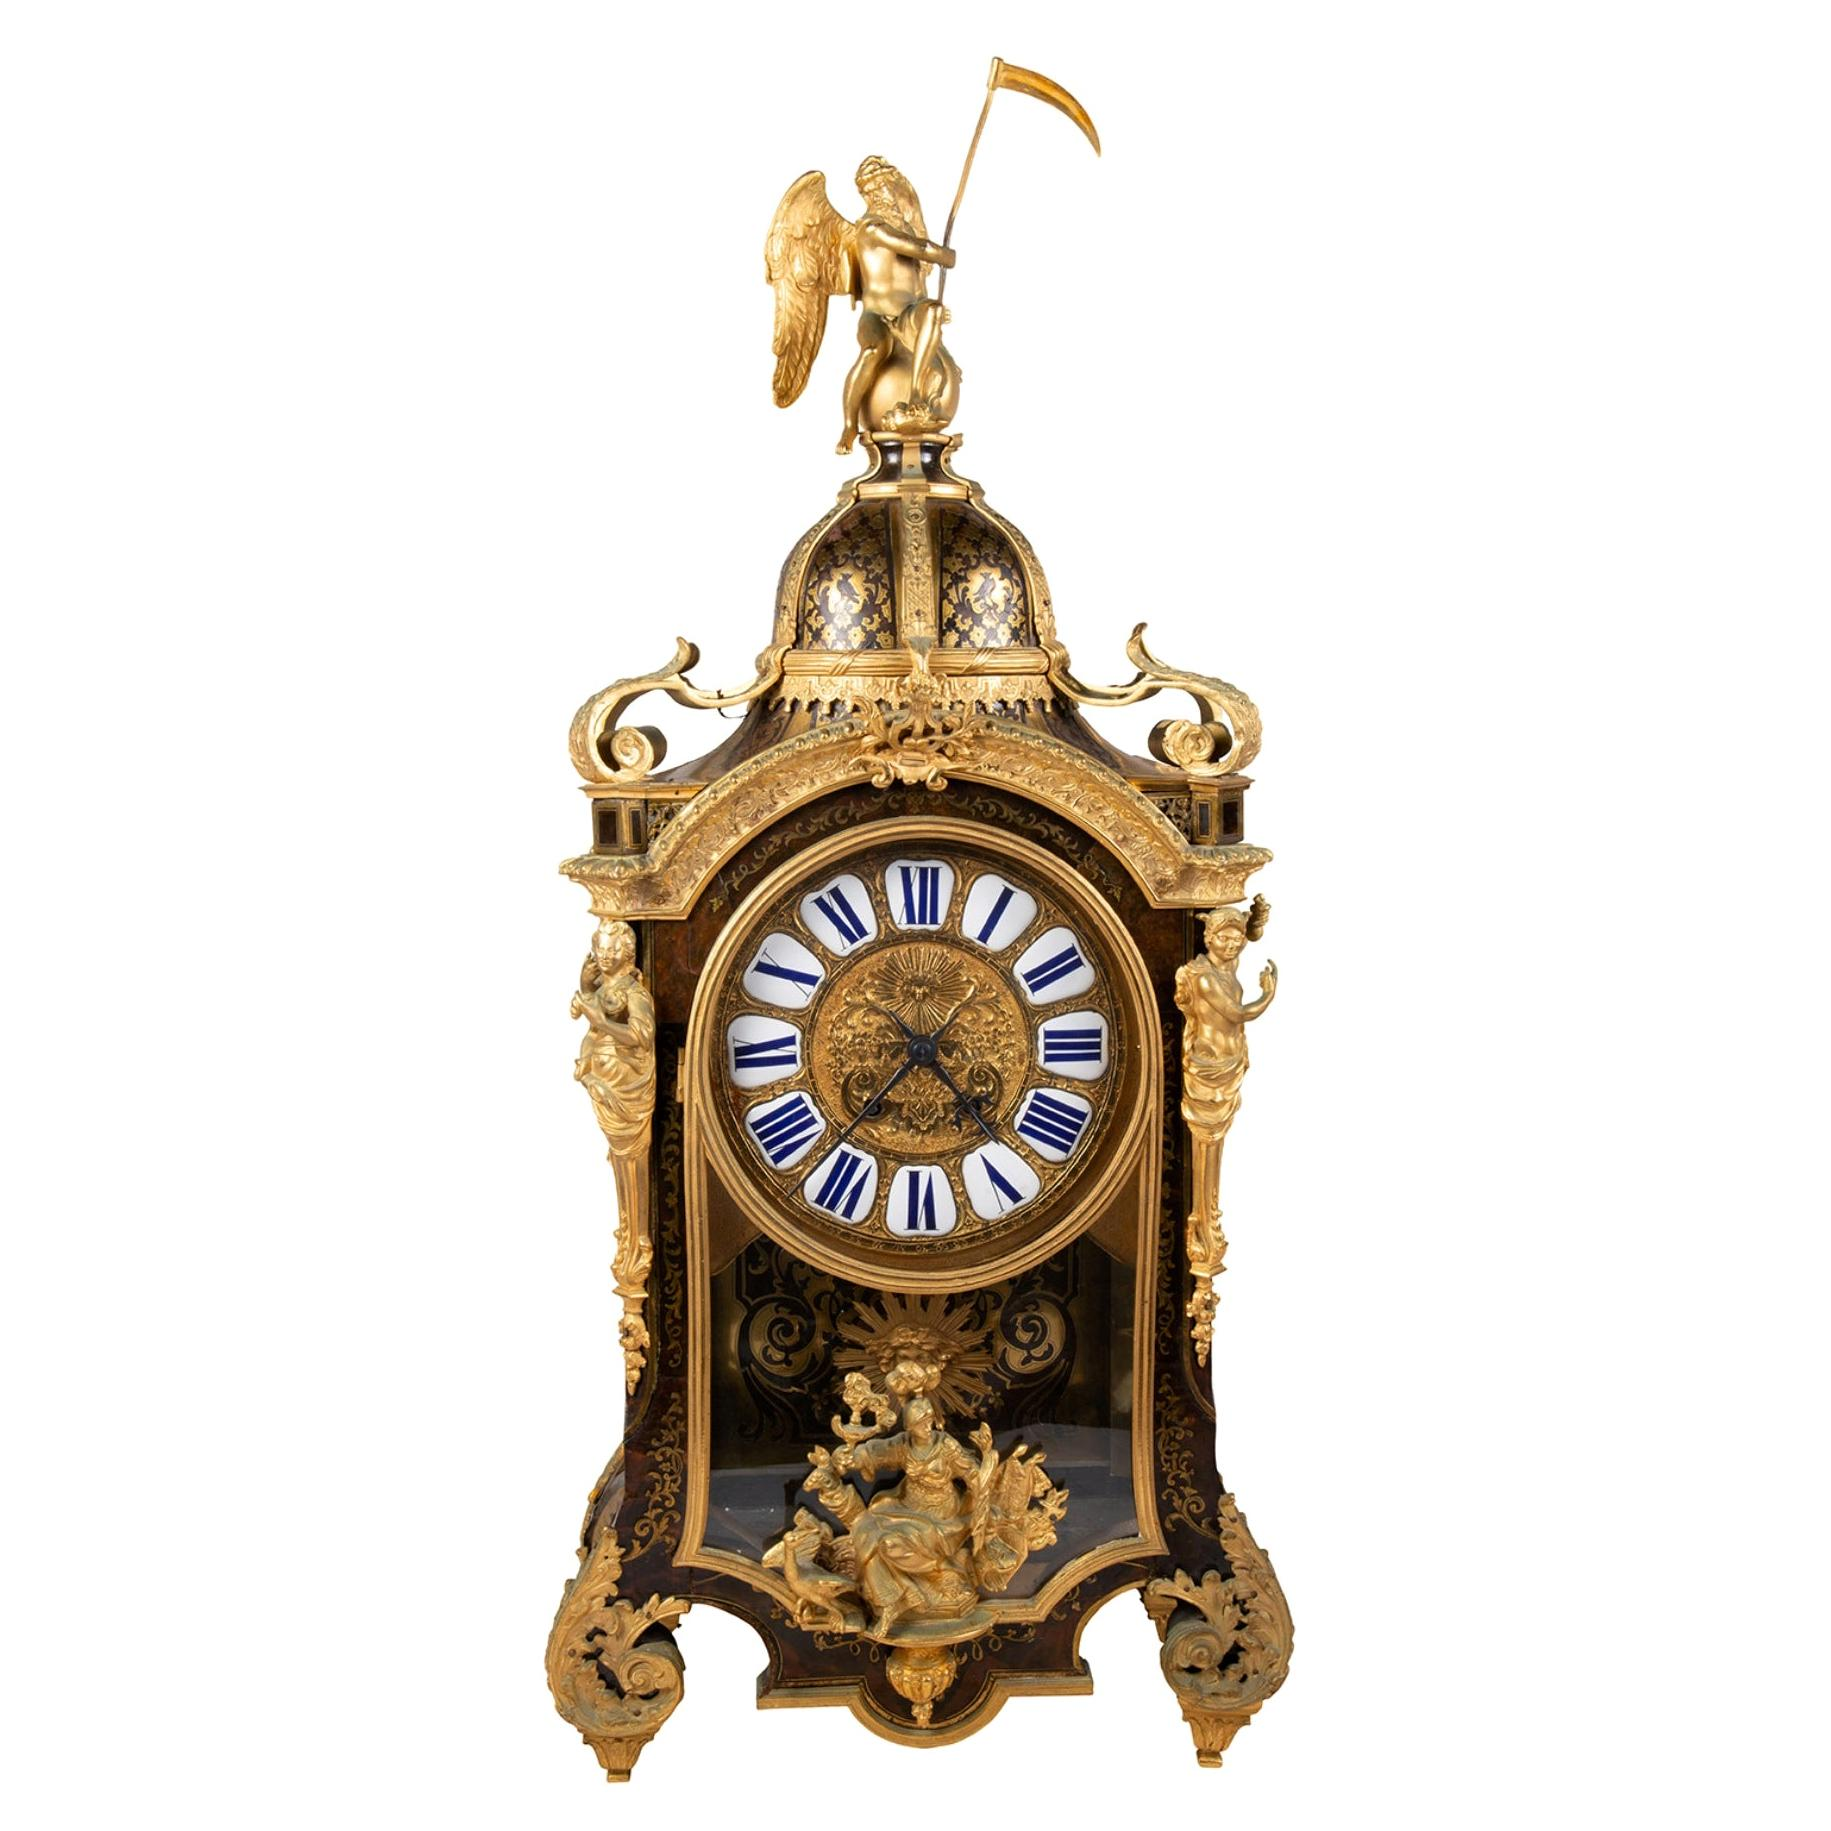 Louis XVI Boulle mantel clock, 19th Century.